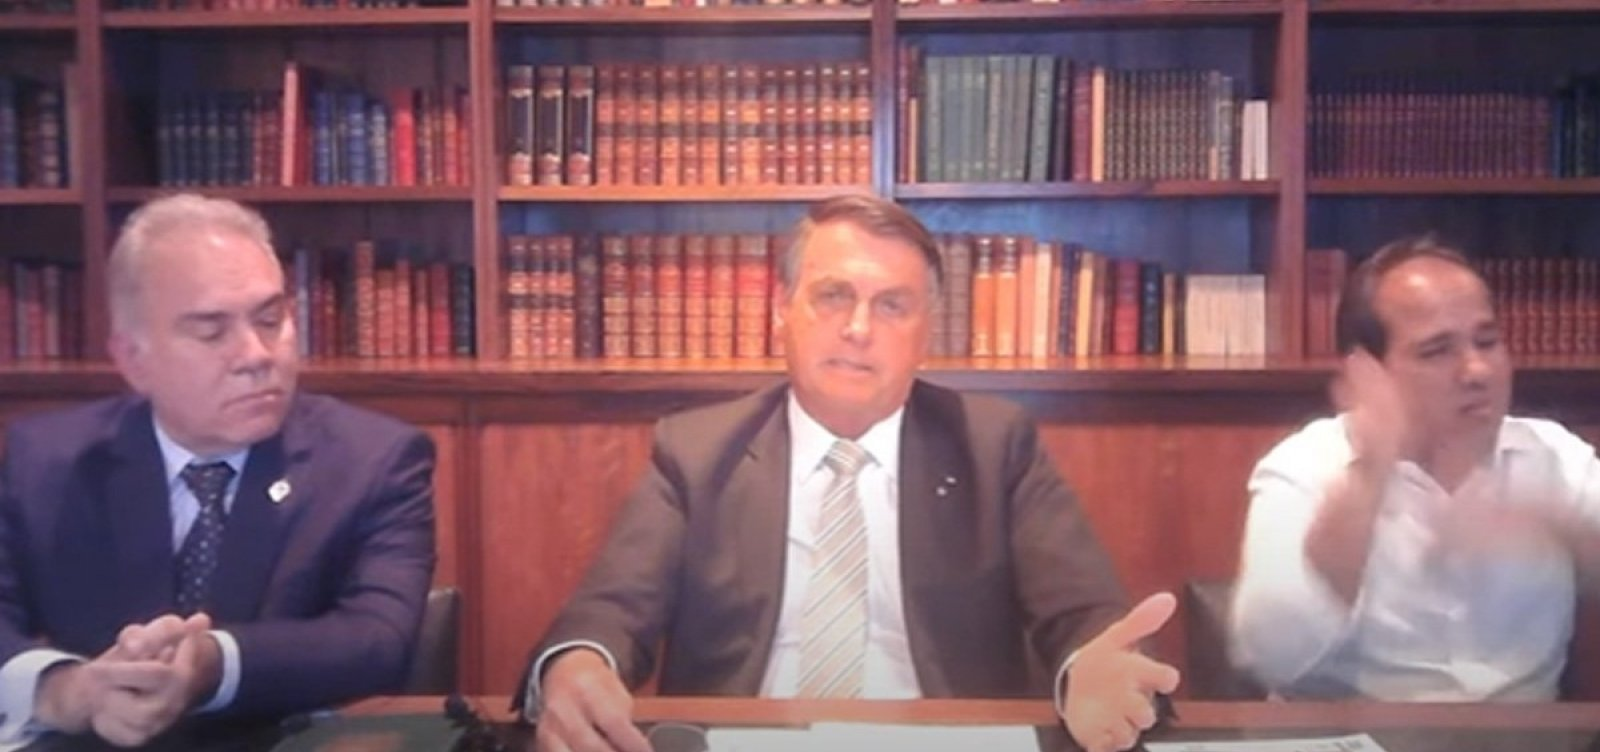 Ministro nega ter recebido ordem de 'Bolsonaro para suspender vacinas em adolescentes